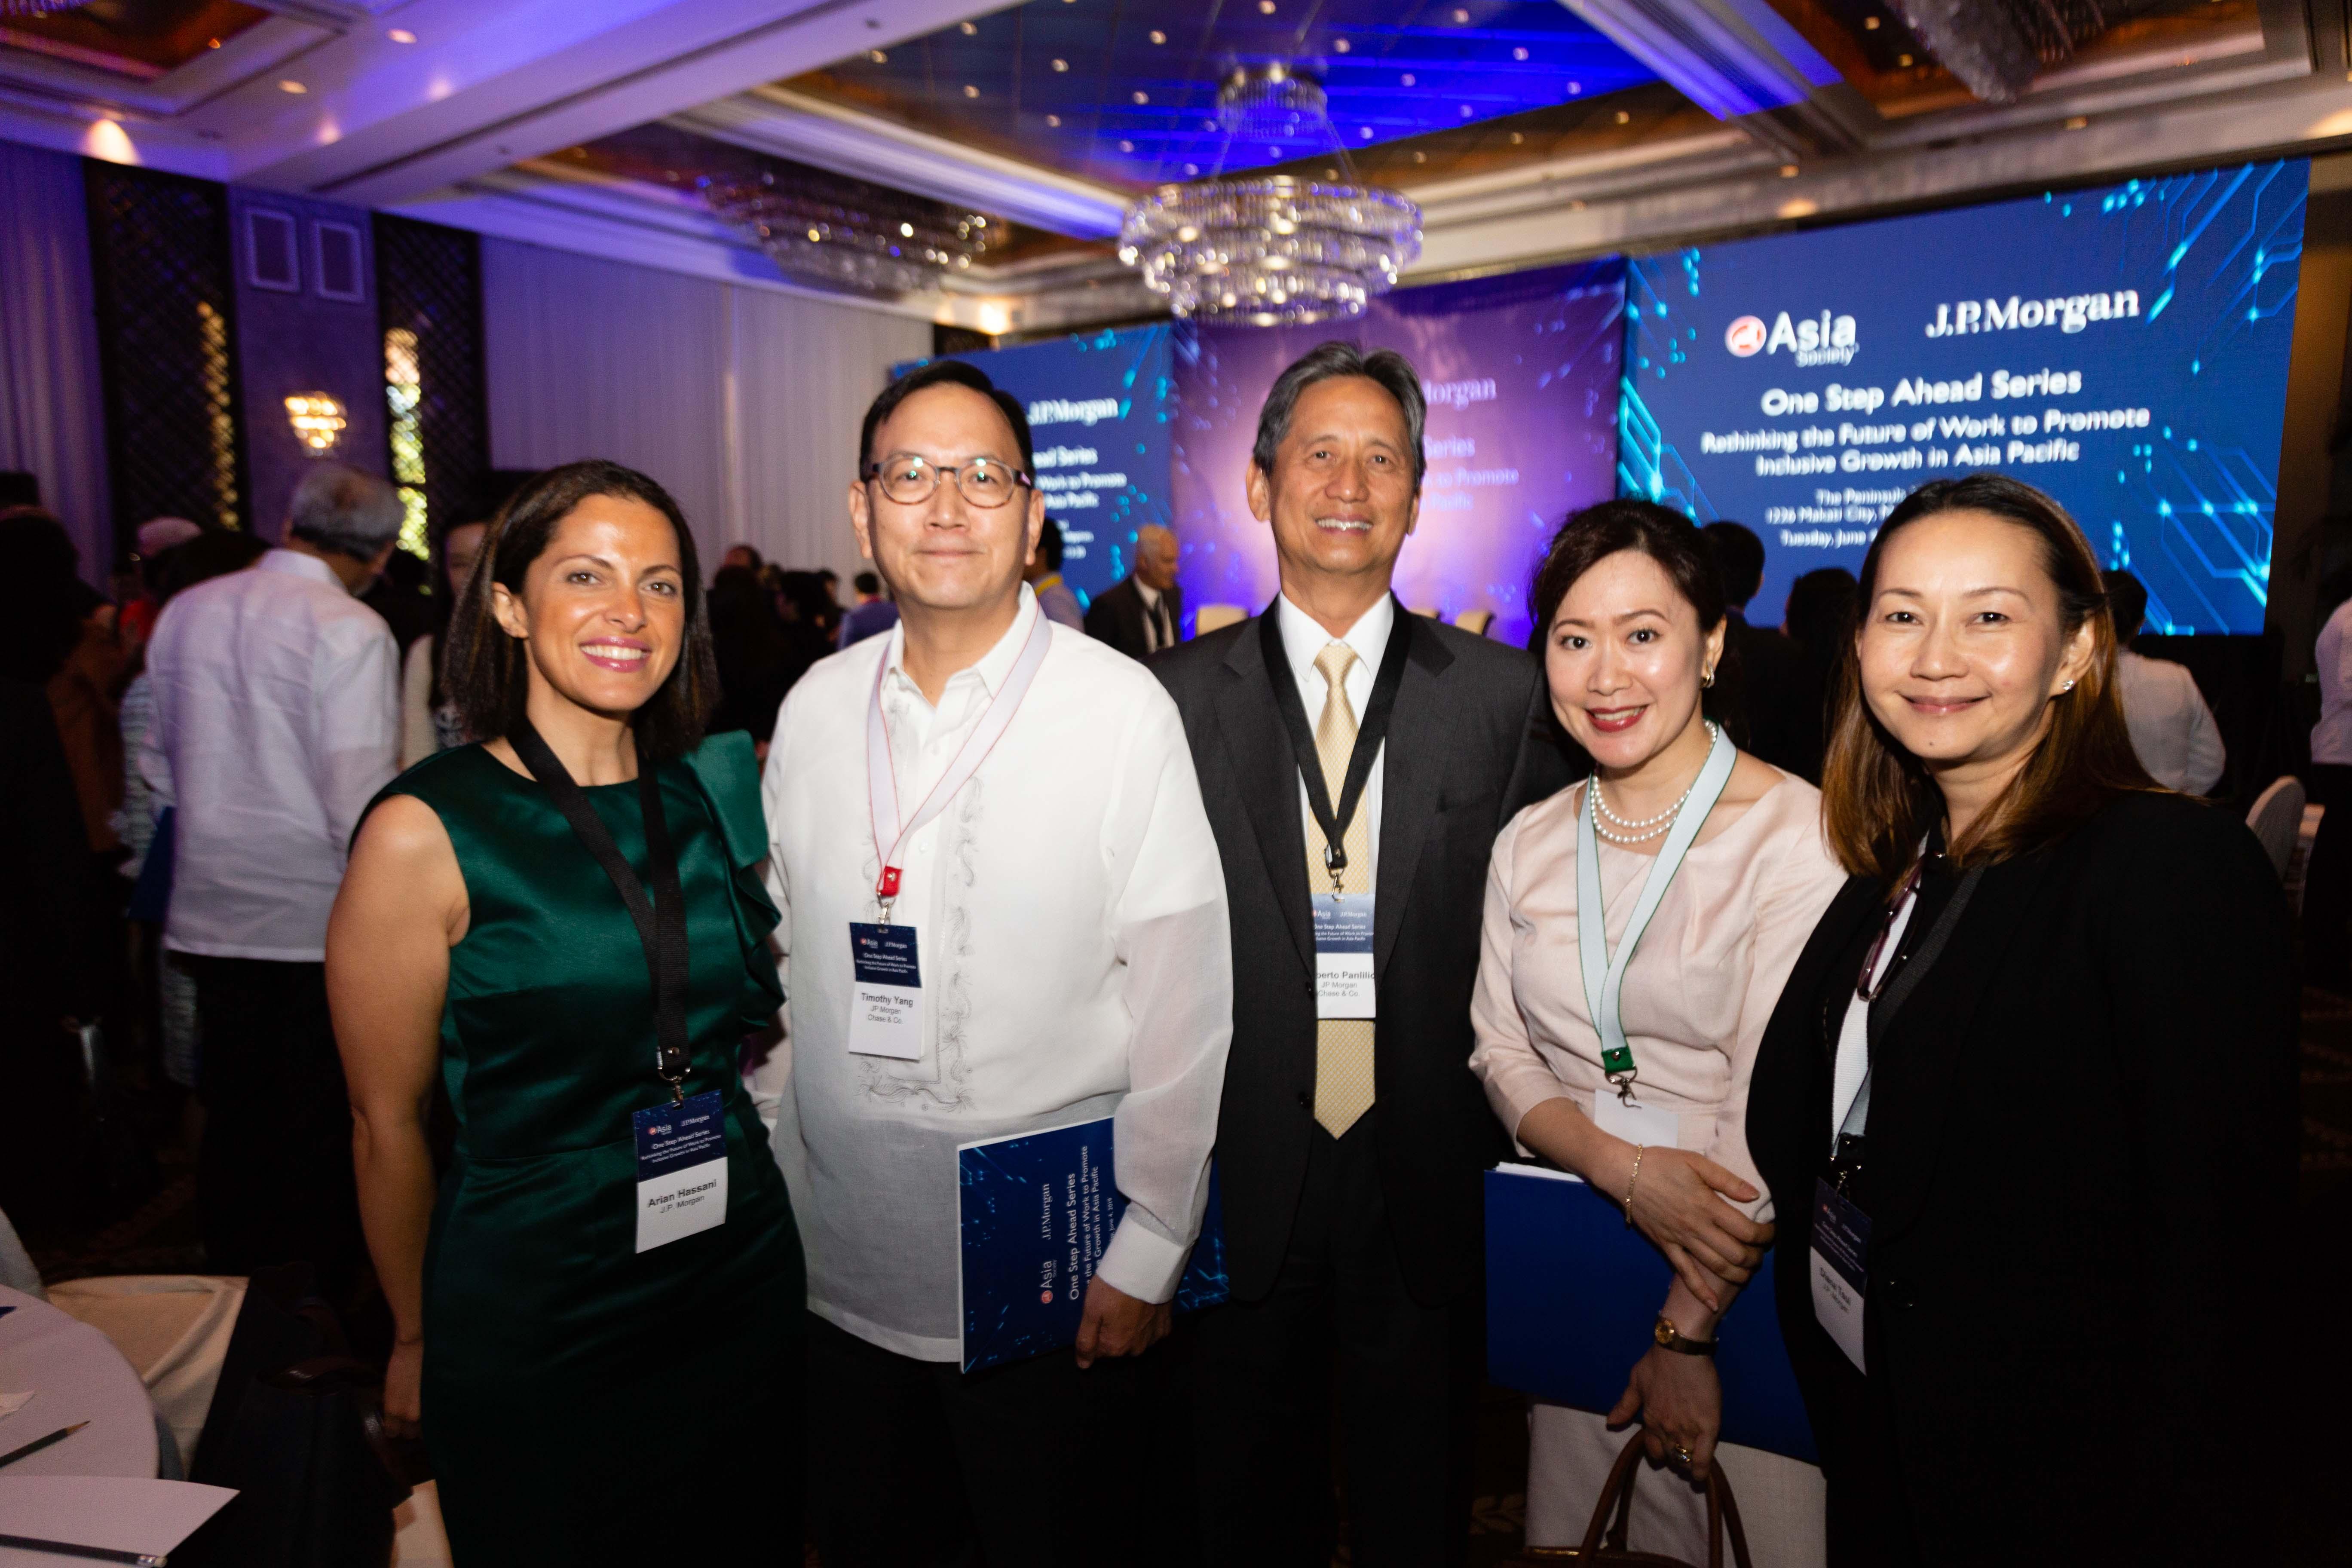 0010 ONE STEP AHEAD Evident JP Morgan Asia Society 2019